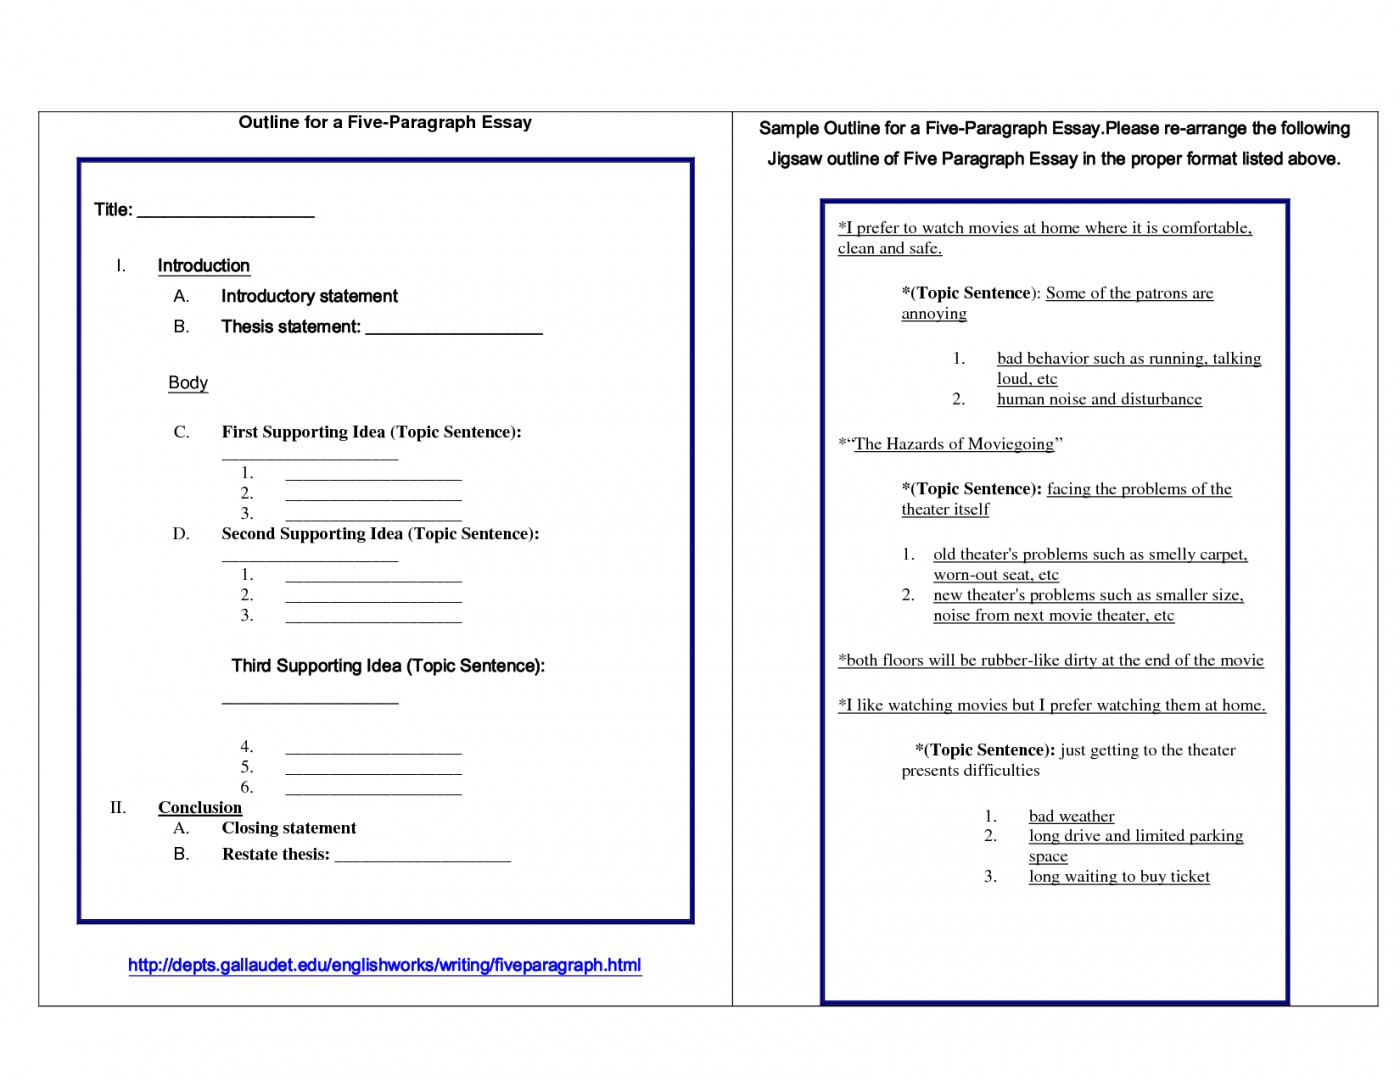 028 Essay Example Paragraph Topics Bunch Ideas Of Outline Persuasive Template Az Unique Best 5 For High School Middle 1400